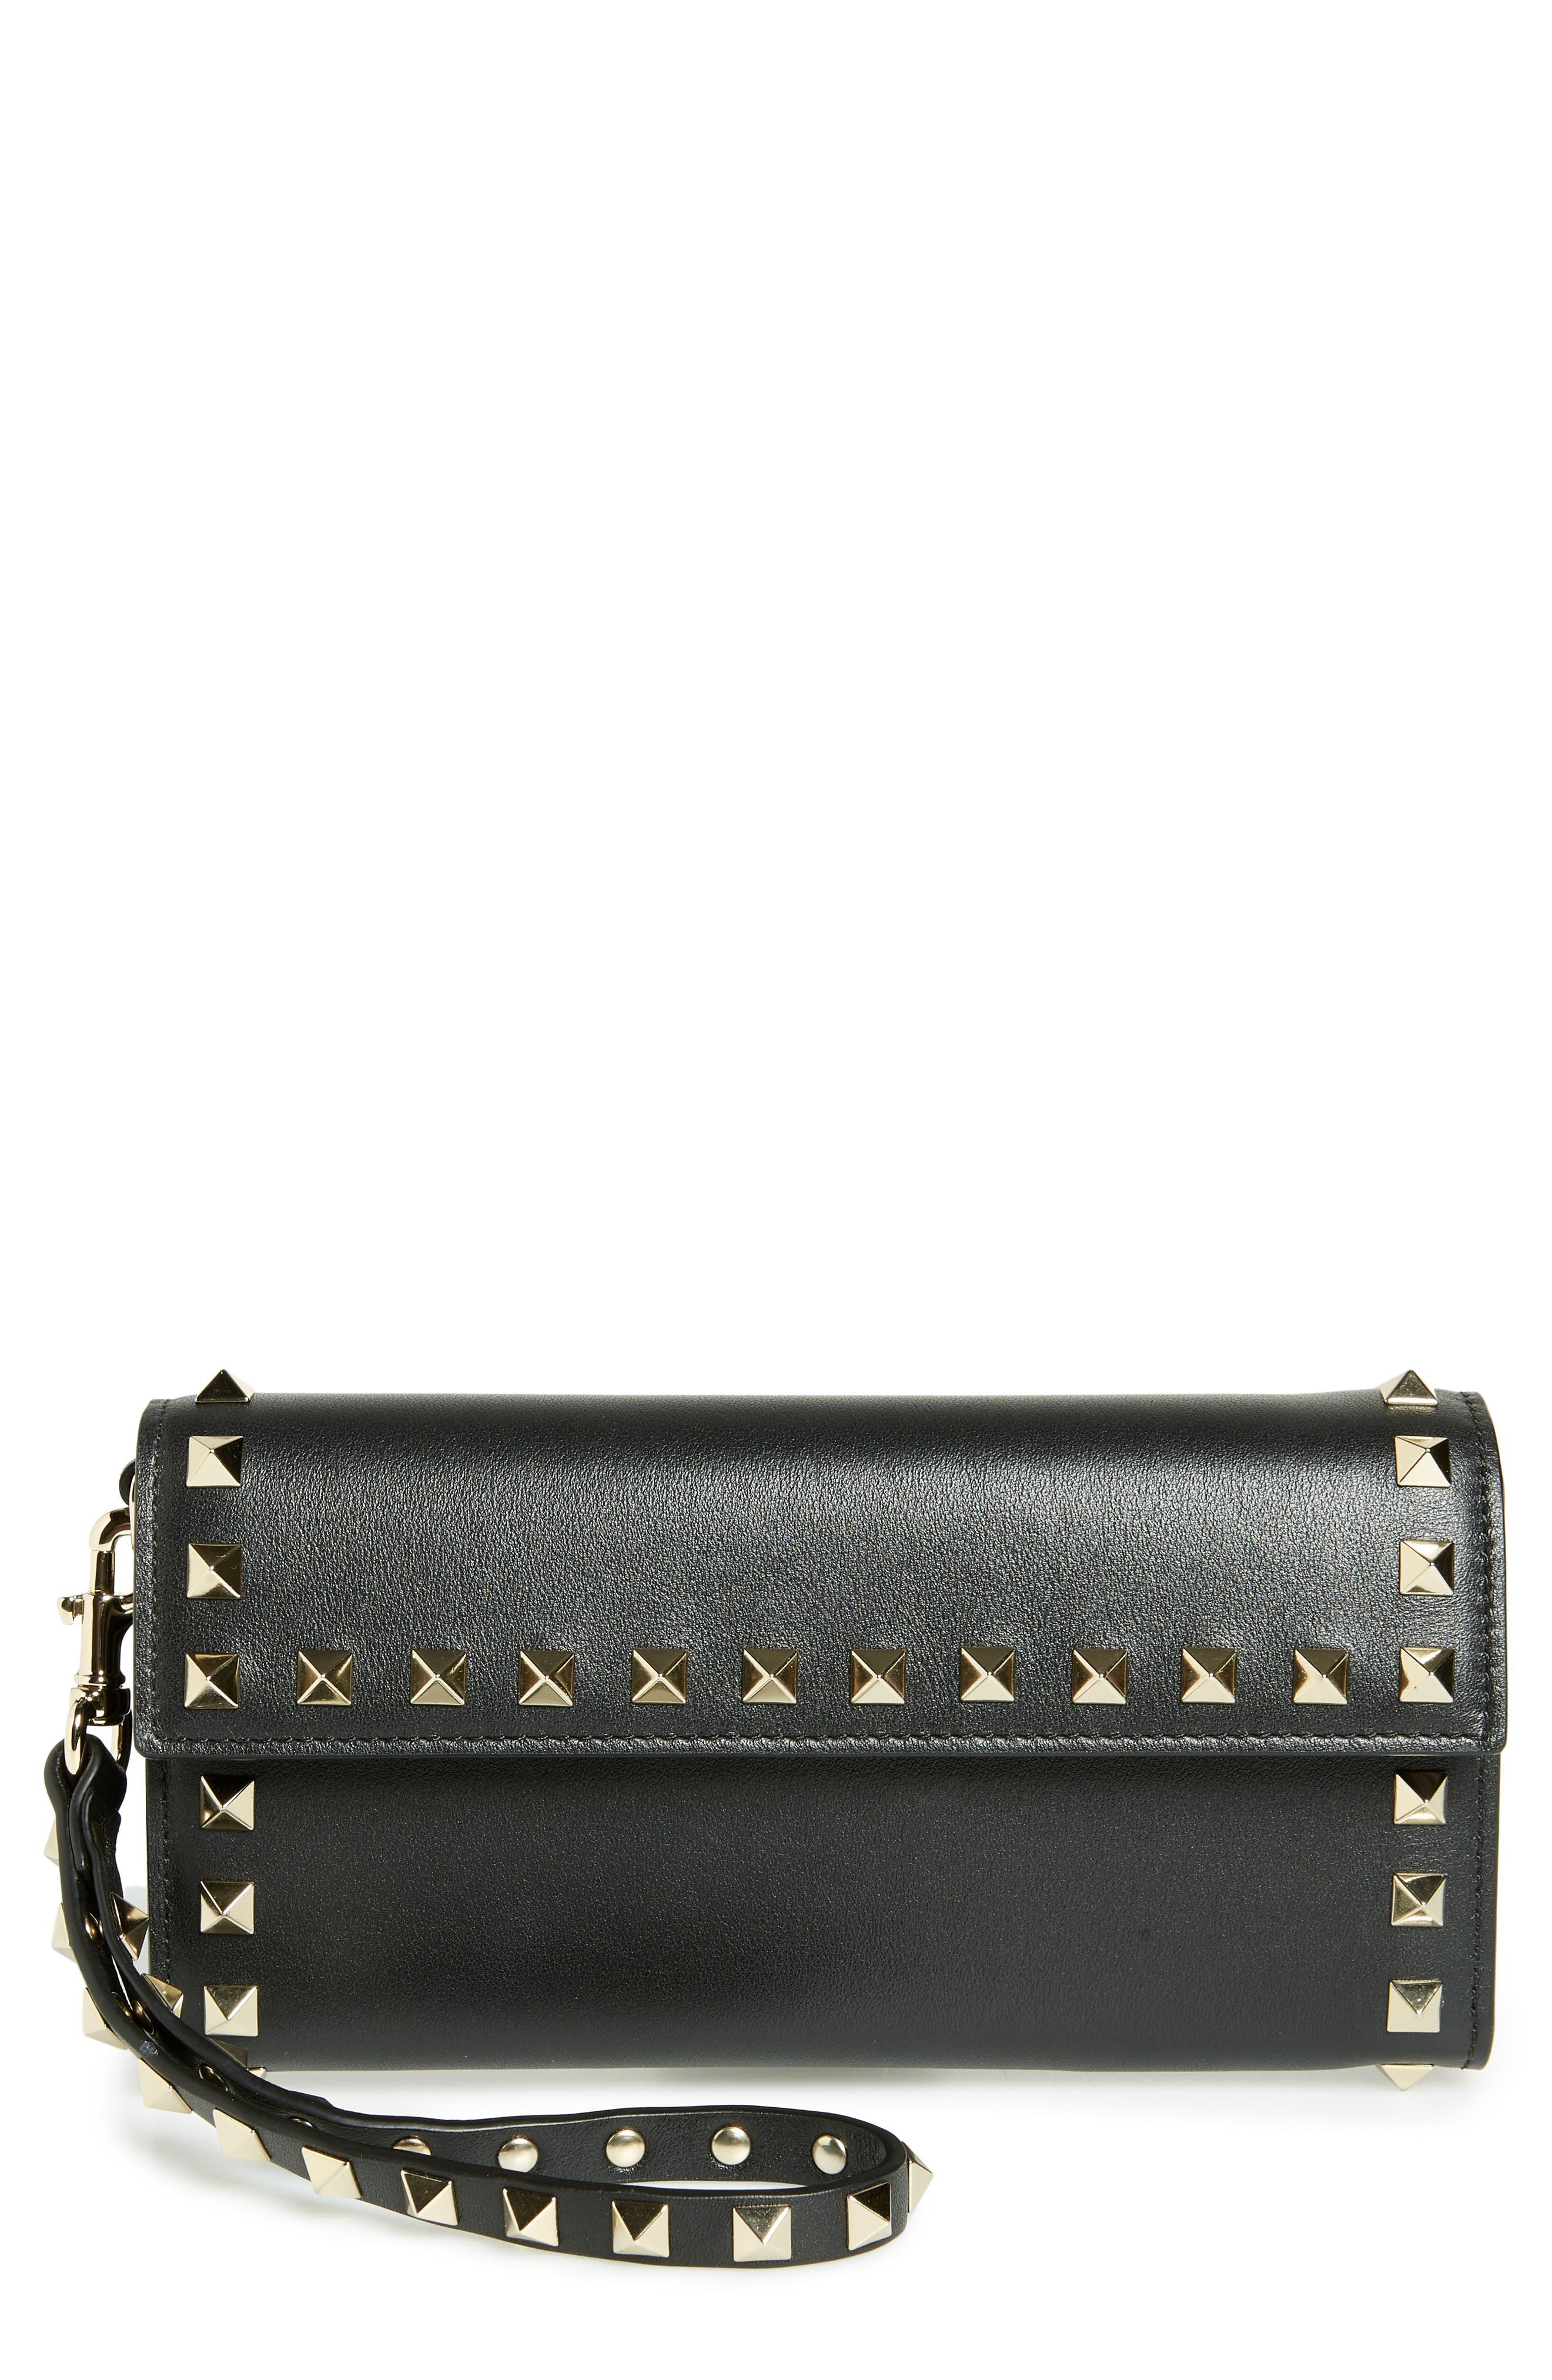 VALENTINO GARAVANI Rockstud Flap Continental Wristlet Wallet